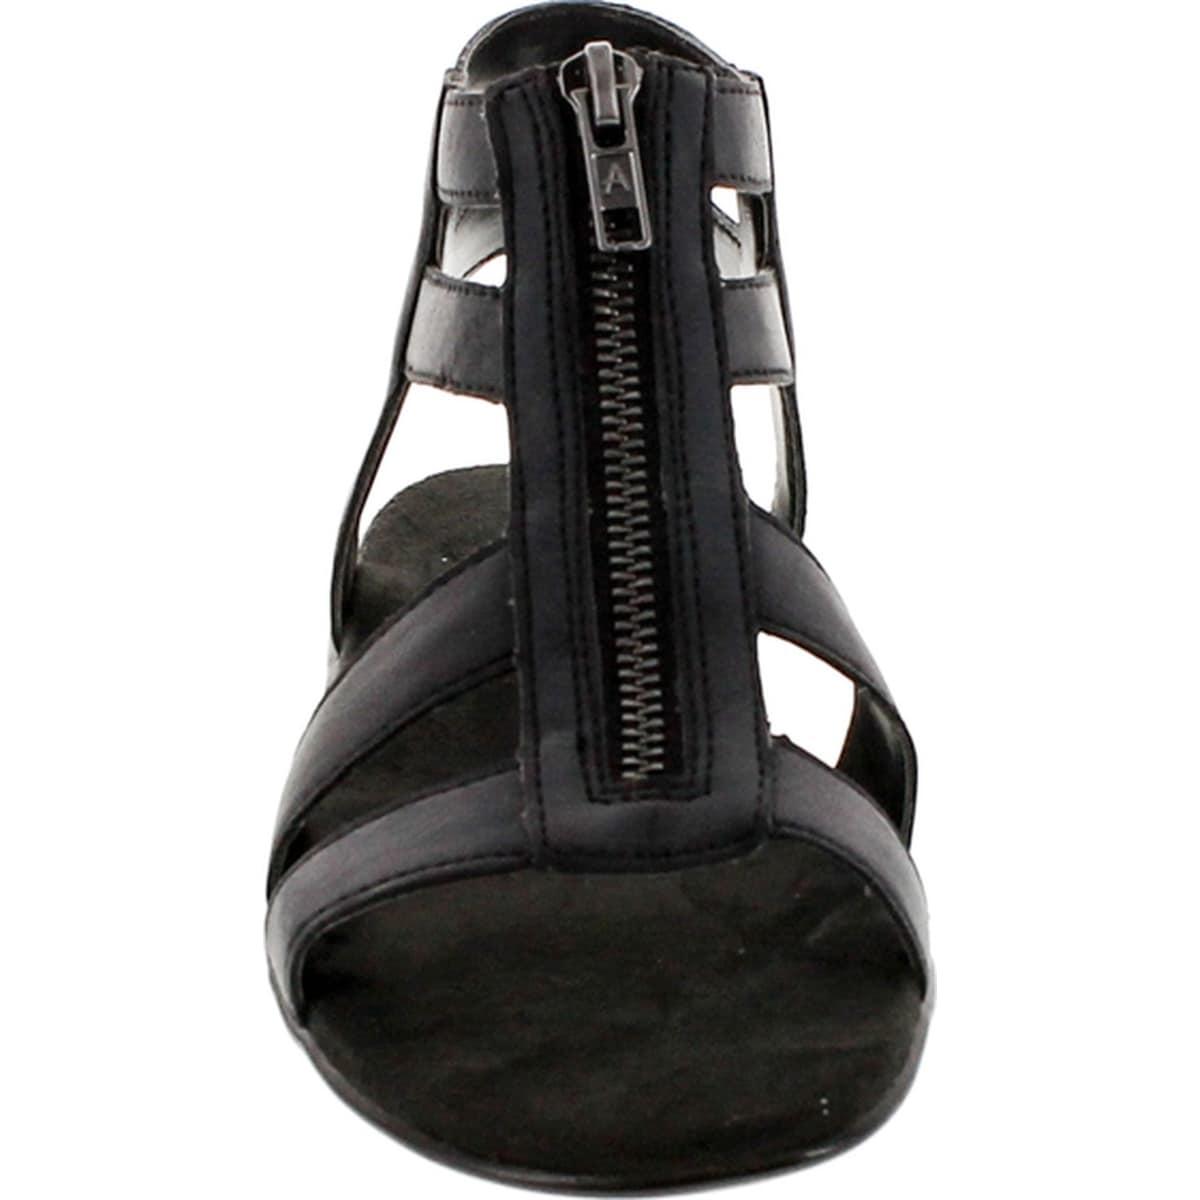 89f4ff3dc7b Shop Aerosoles Women s Encychlopedia Gladiator Sandal - Free Shipping On  Orders Over  45 - Overstock - 20908537